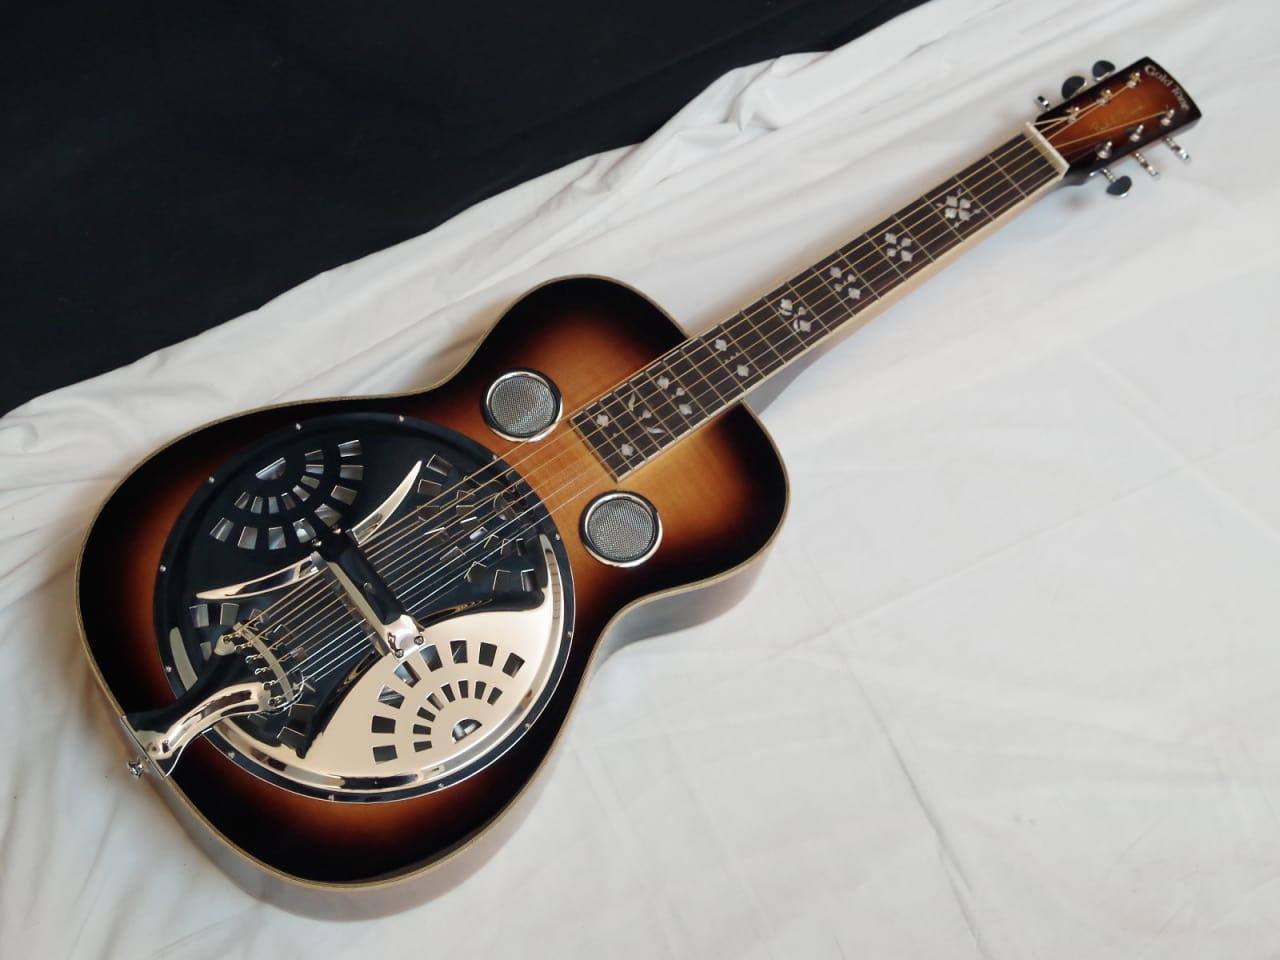 Gold Tone Pbs D Paul Beard Square Neck Deluxe Resonator Reverb